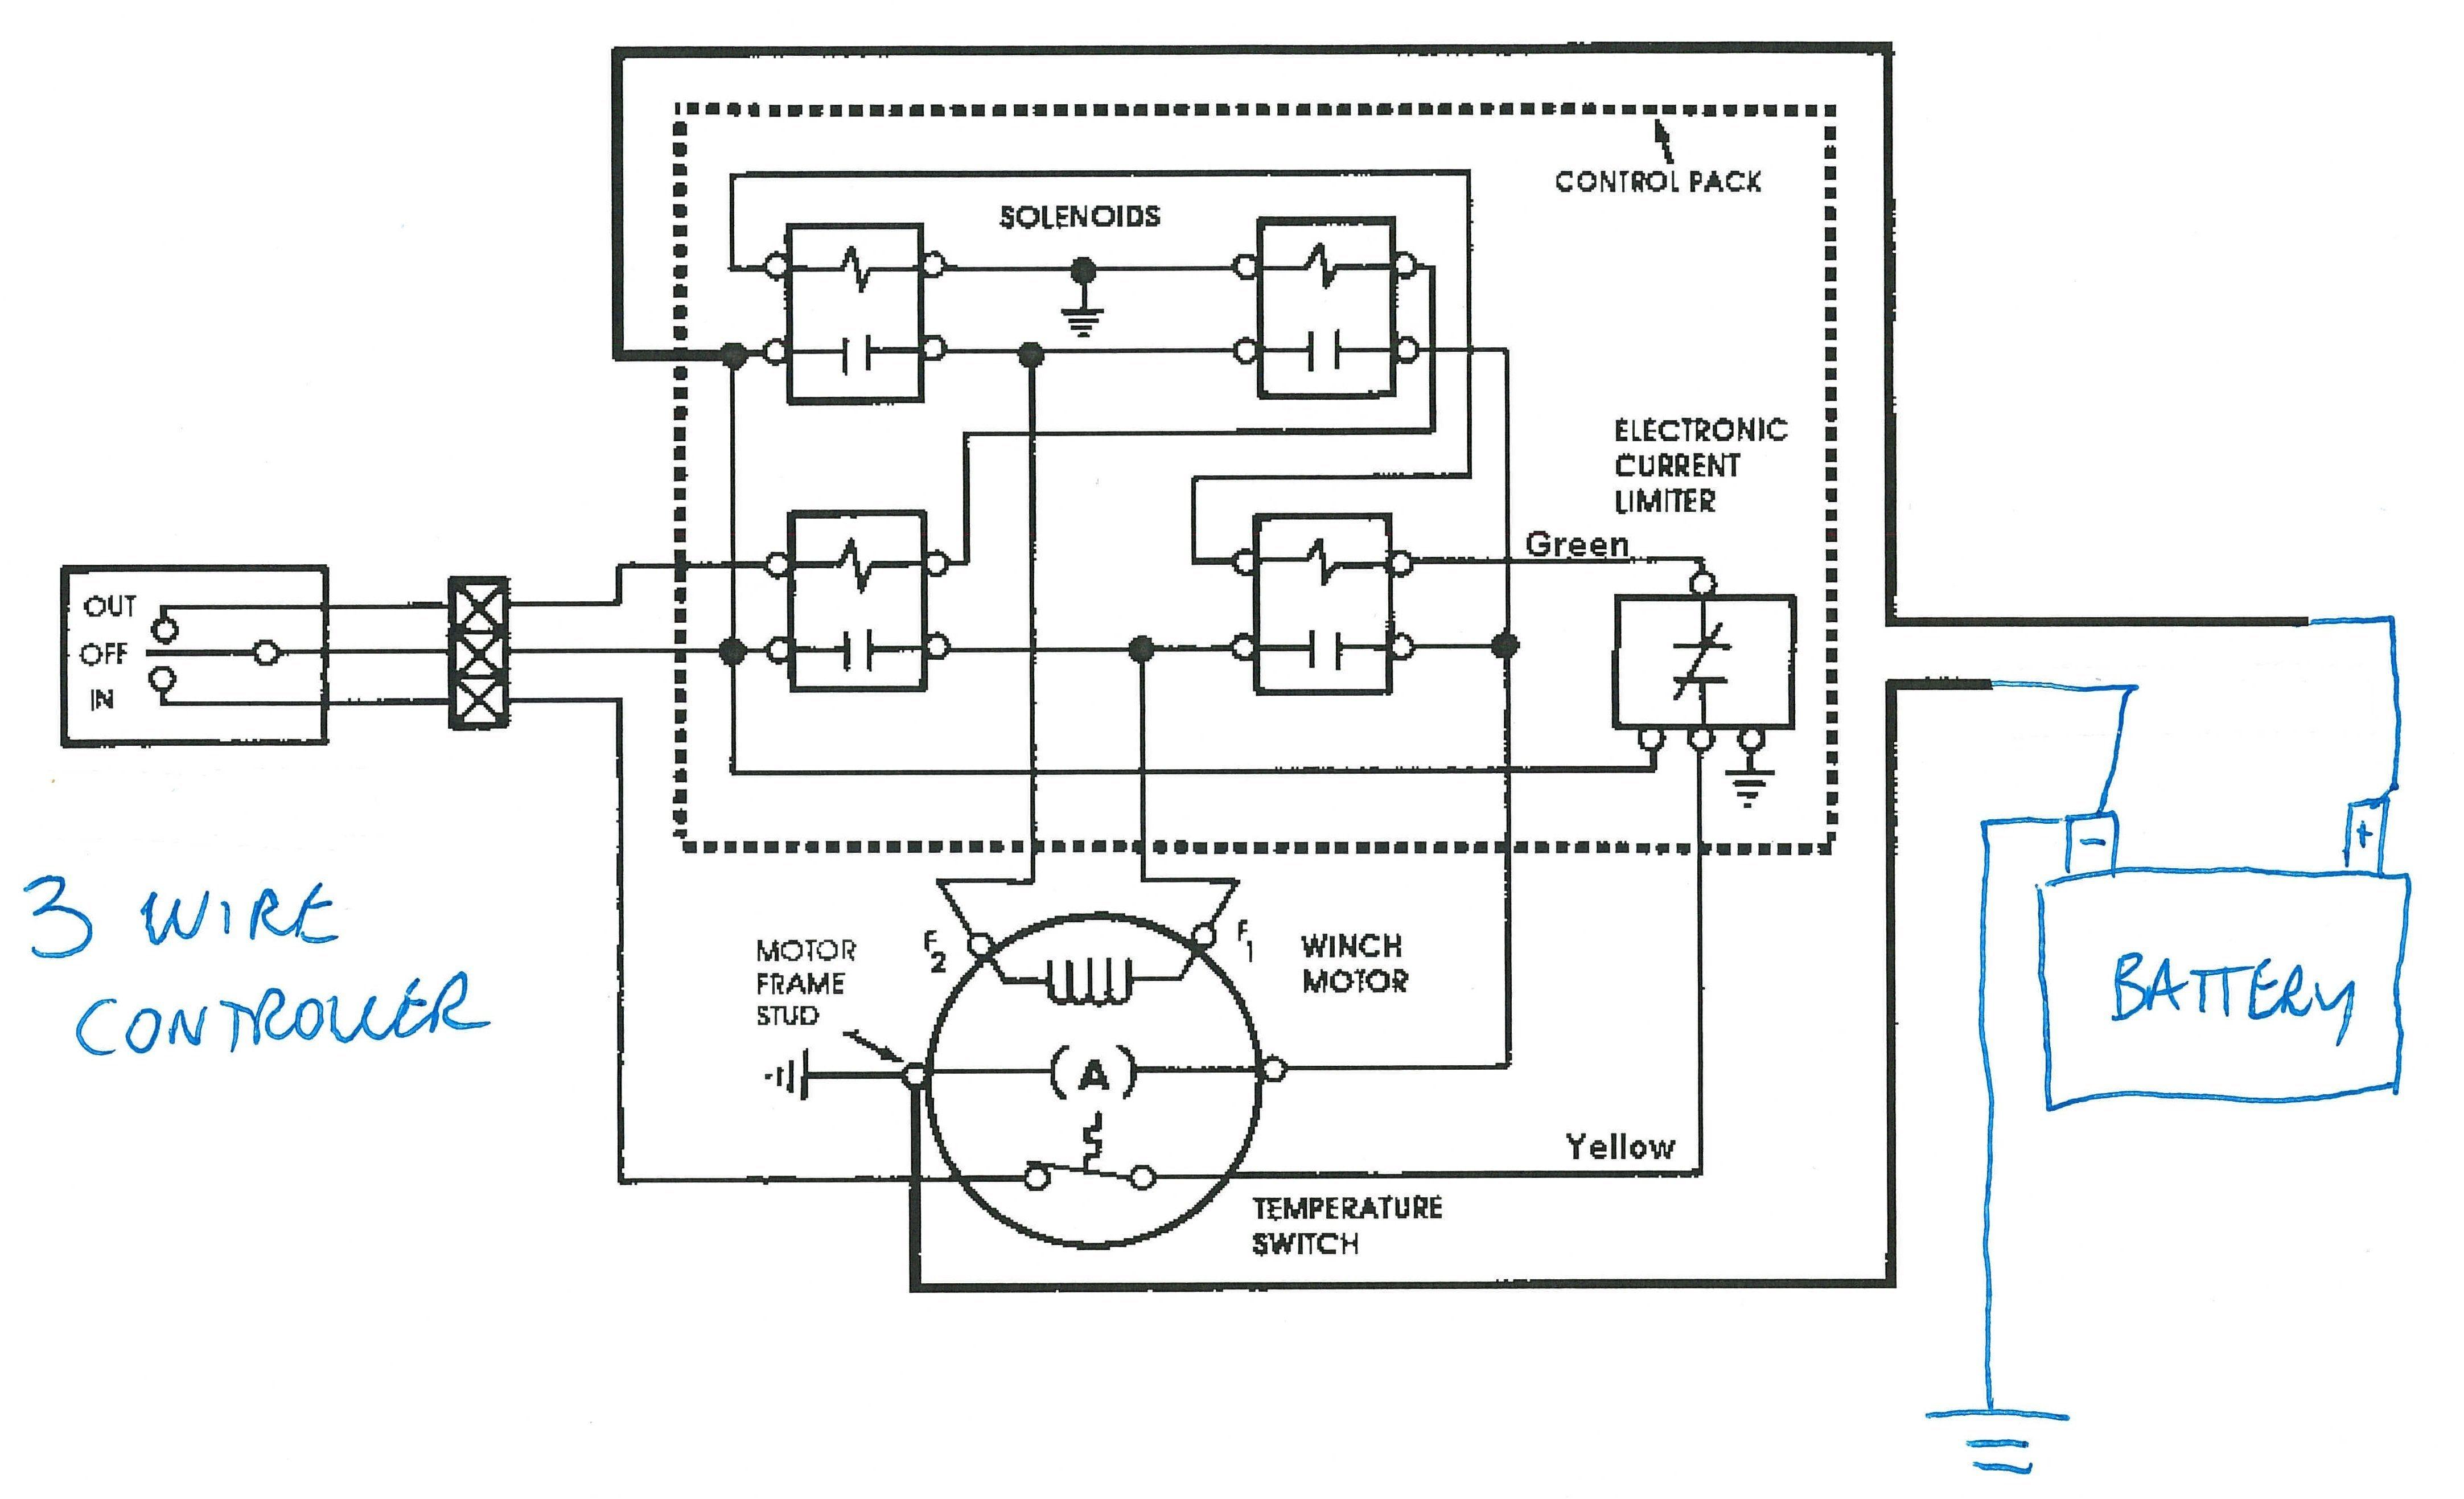 Atv Winch Wiring Diagram Warn 8274 Wiring Diagram Of Atv Winch Wiring Diagram